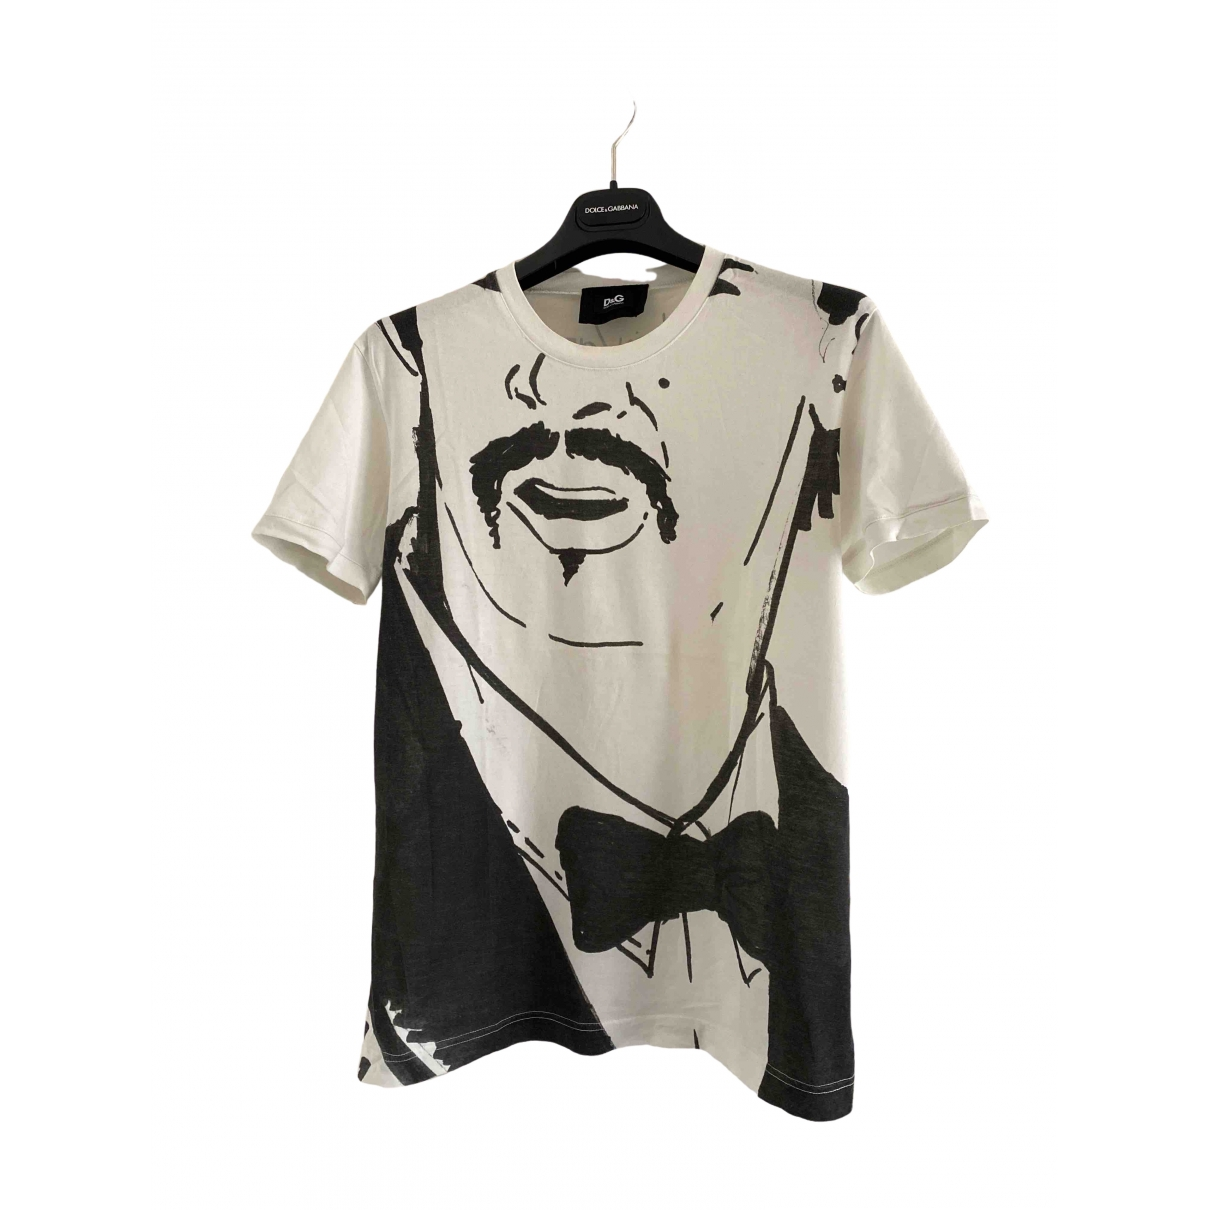 D&g \N White Cotton T-shirts for Men L International